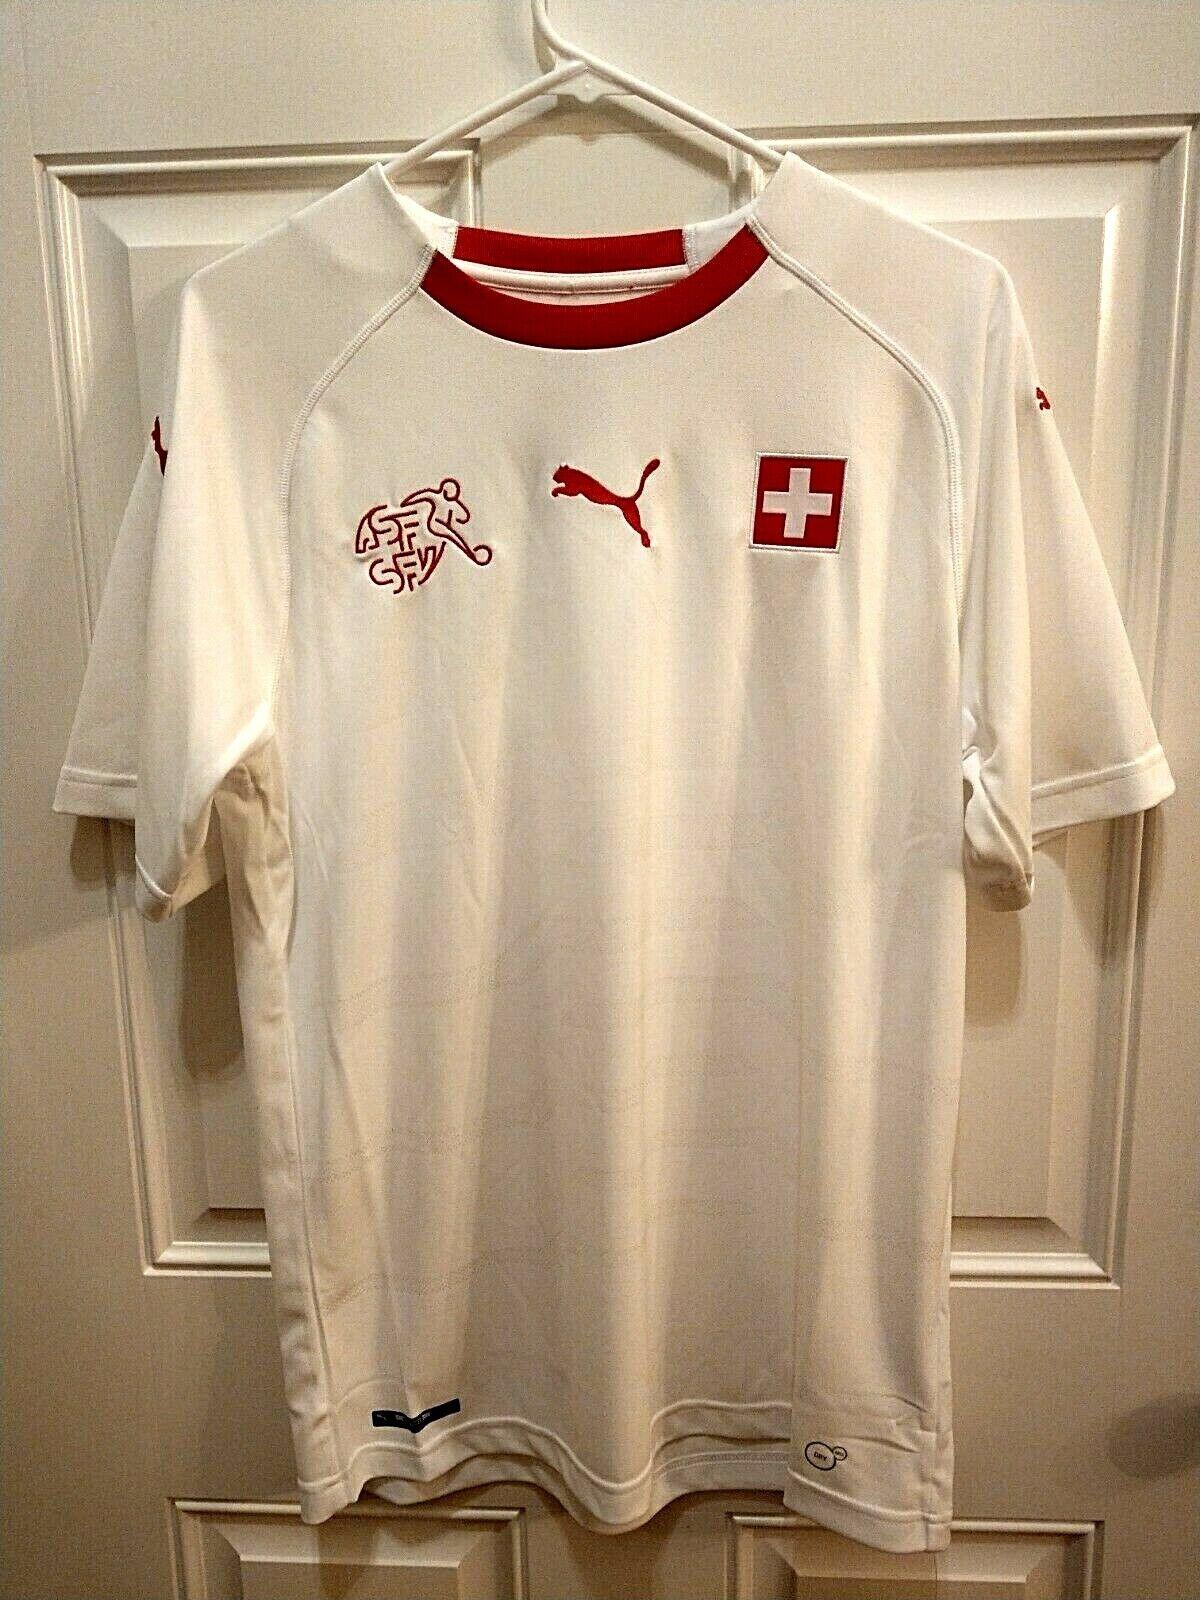 Puma Switzerland Suisse 2018 Away Soccer Jersey bianca rosso 752479 02 Dimensione M